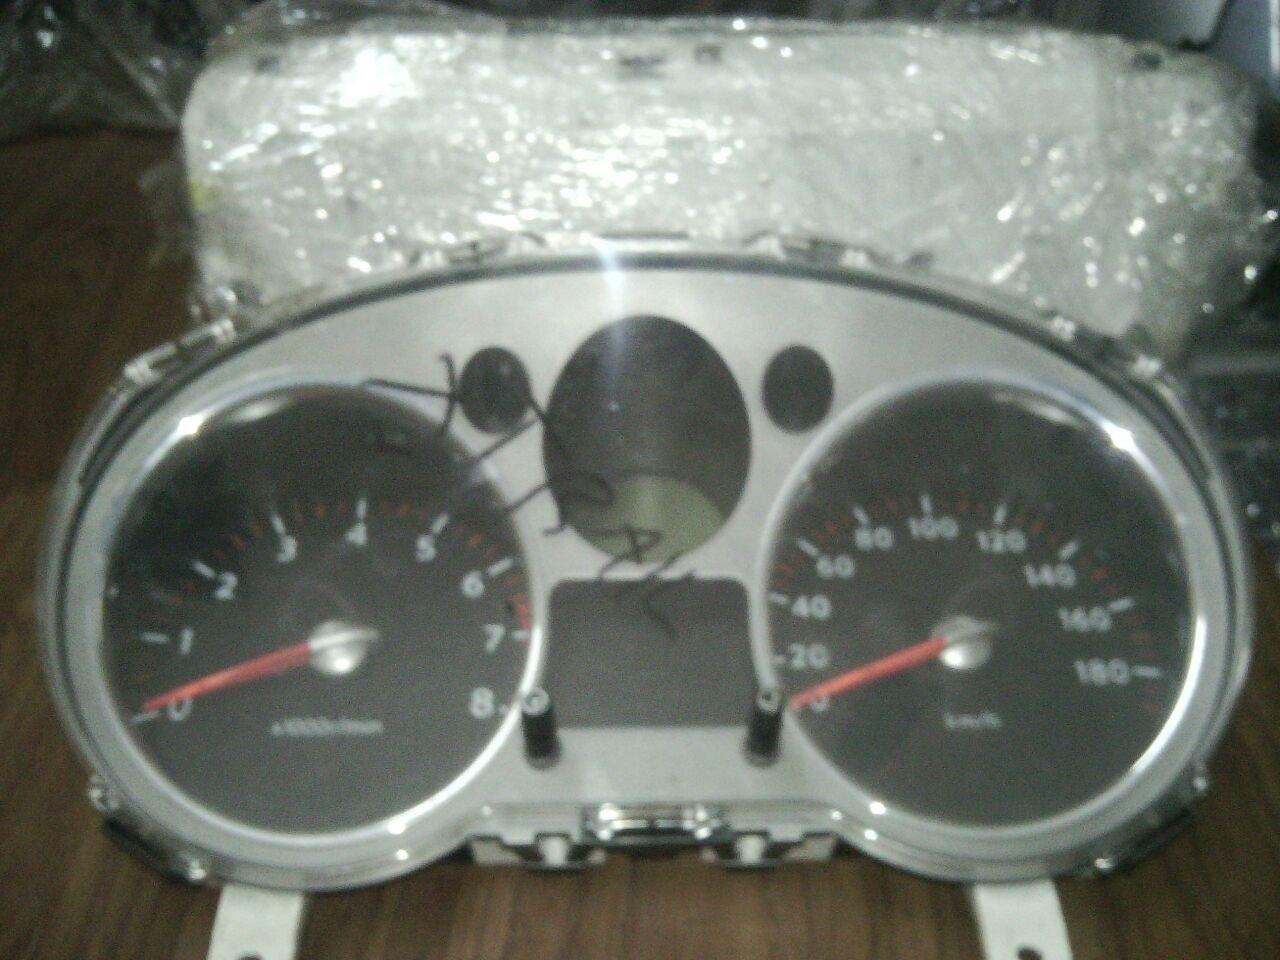 Nissan xtrail speedo metar nt31 00518